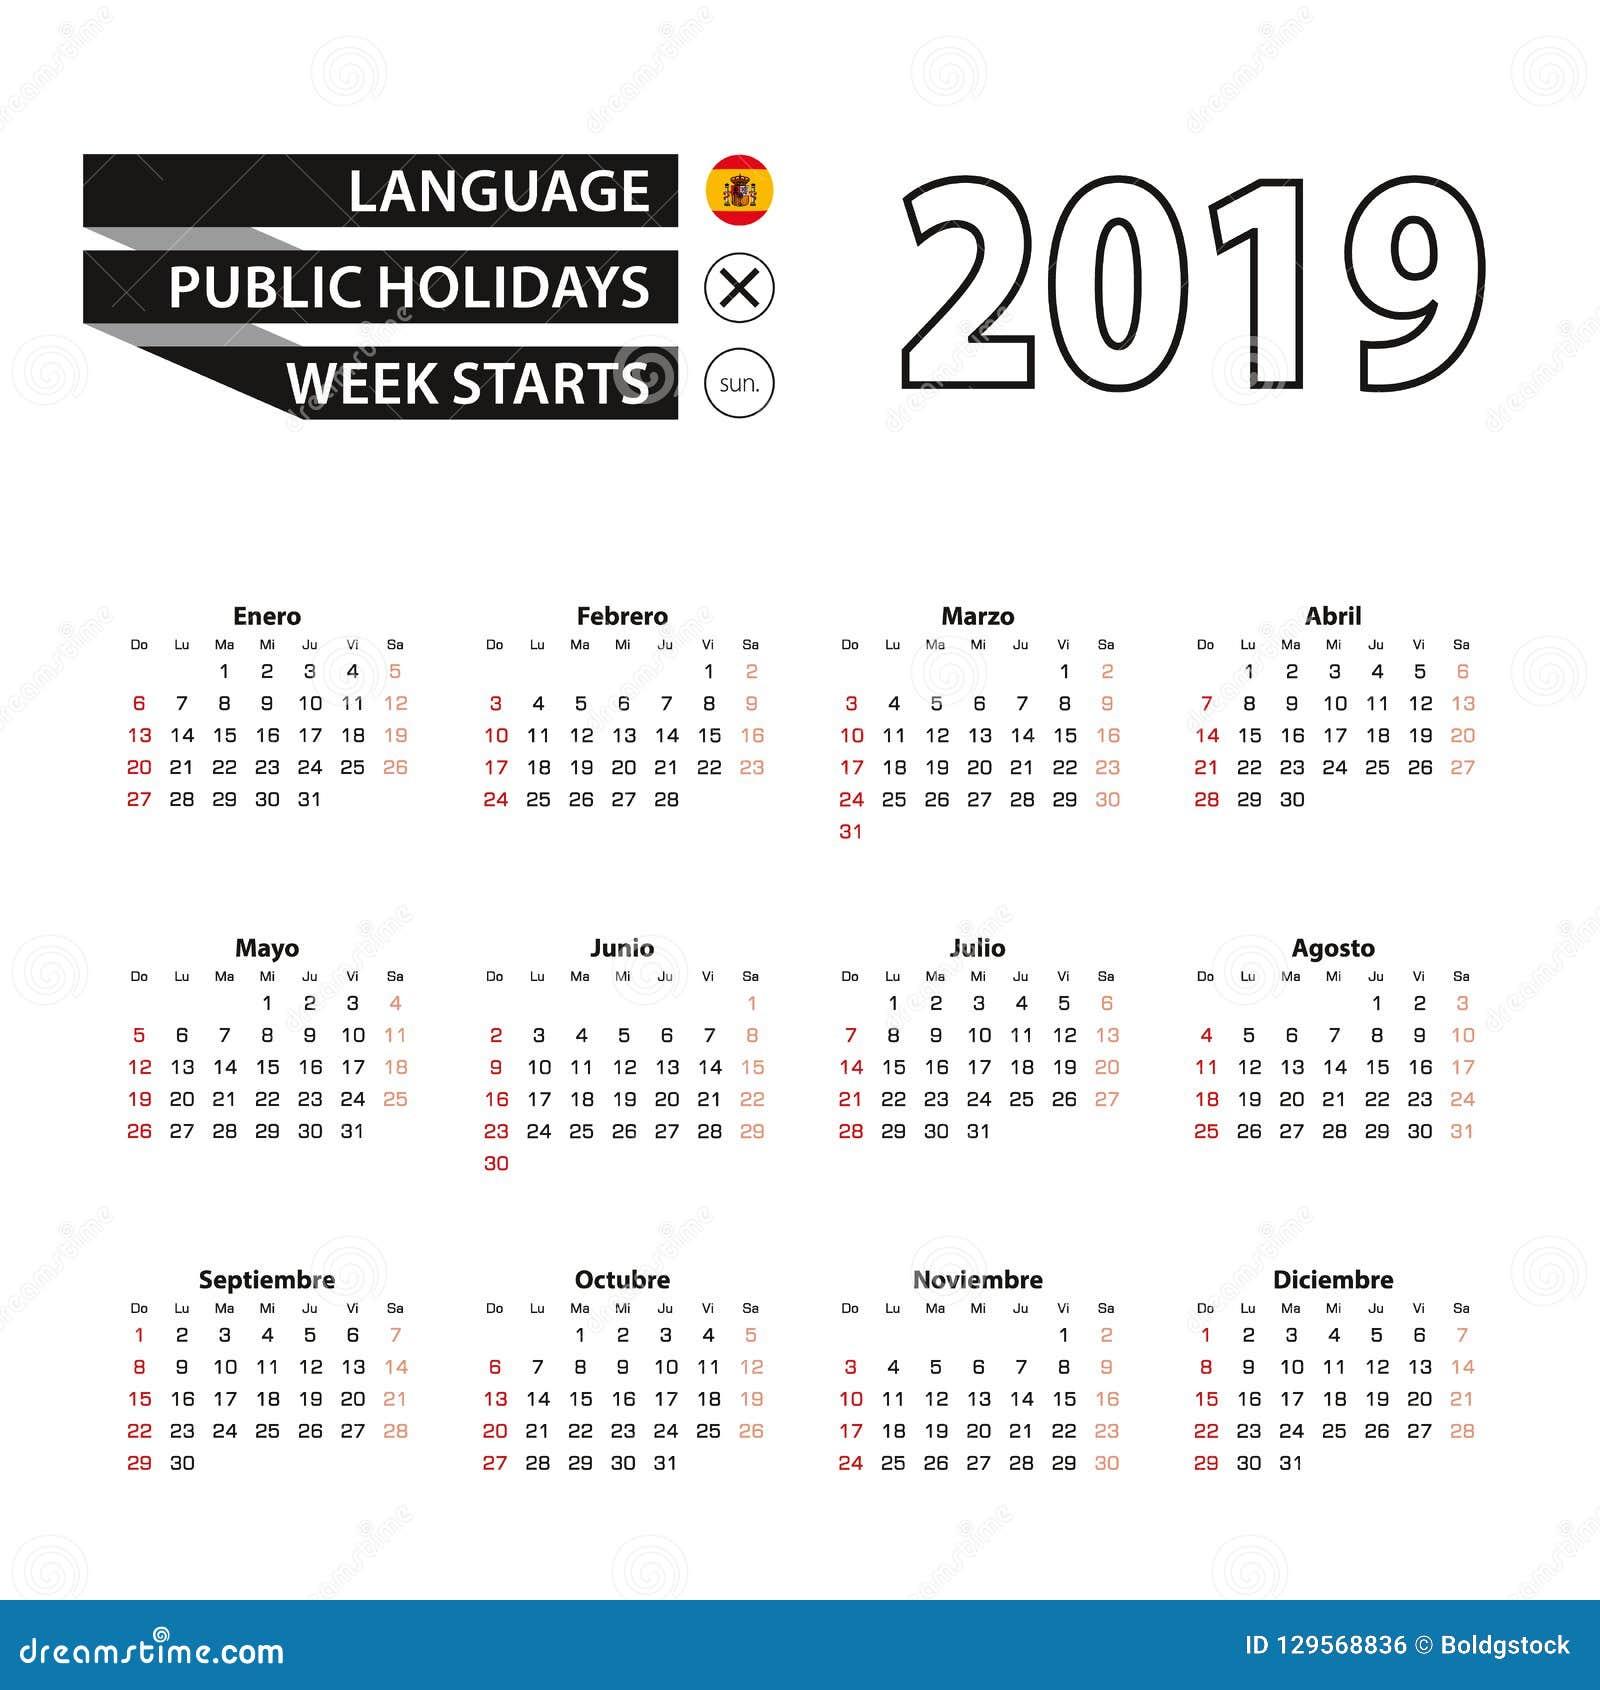 Calendario 2019 Con Numero Week.2019 Calendar In Spanish Language Week Starts From Sunday